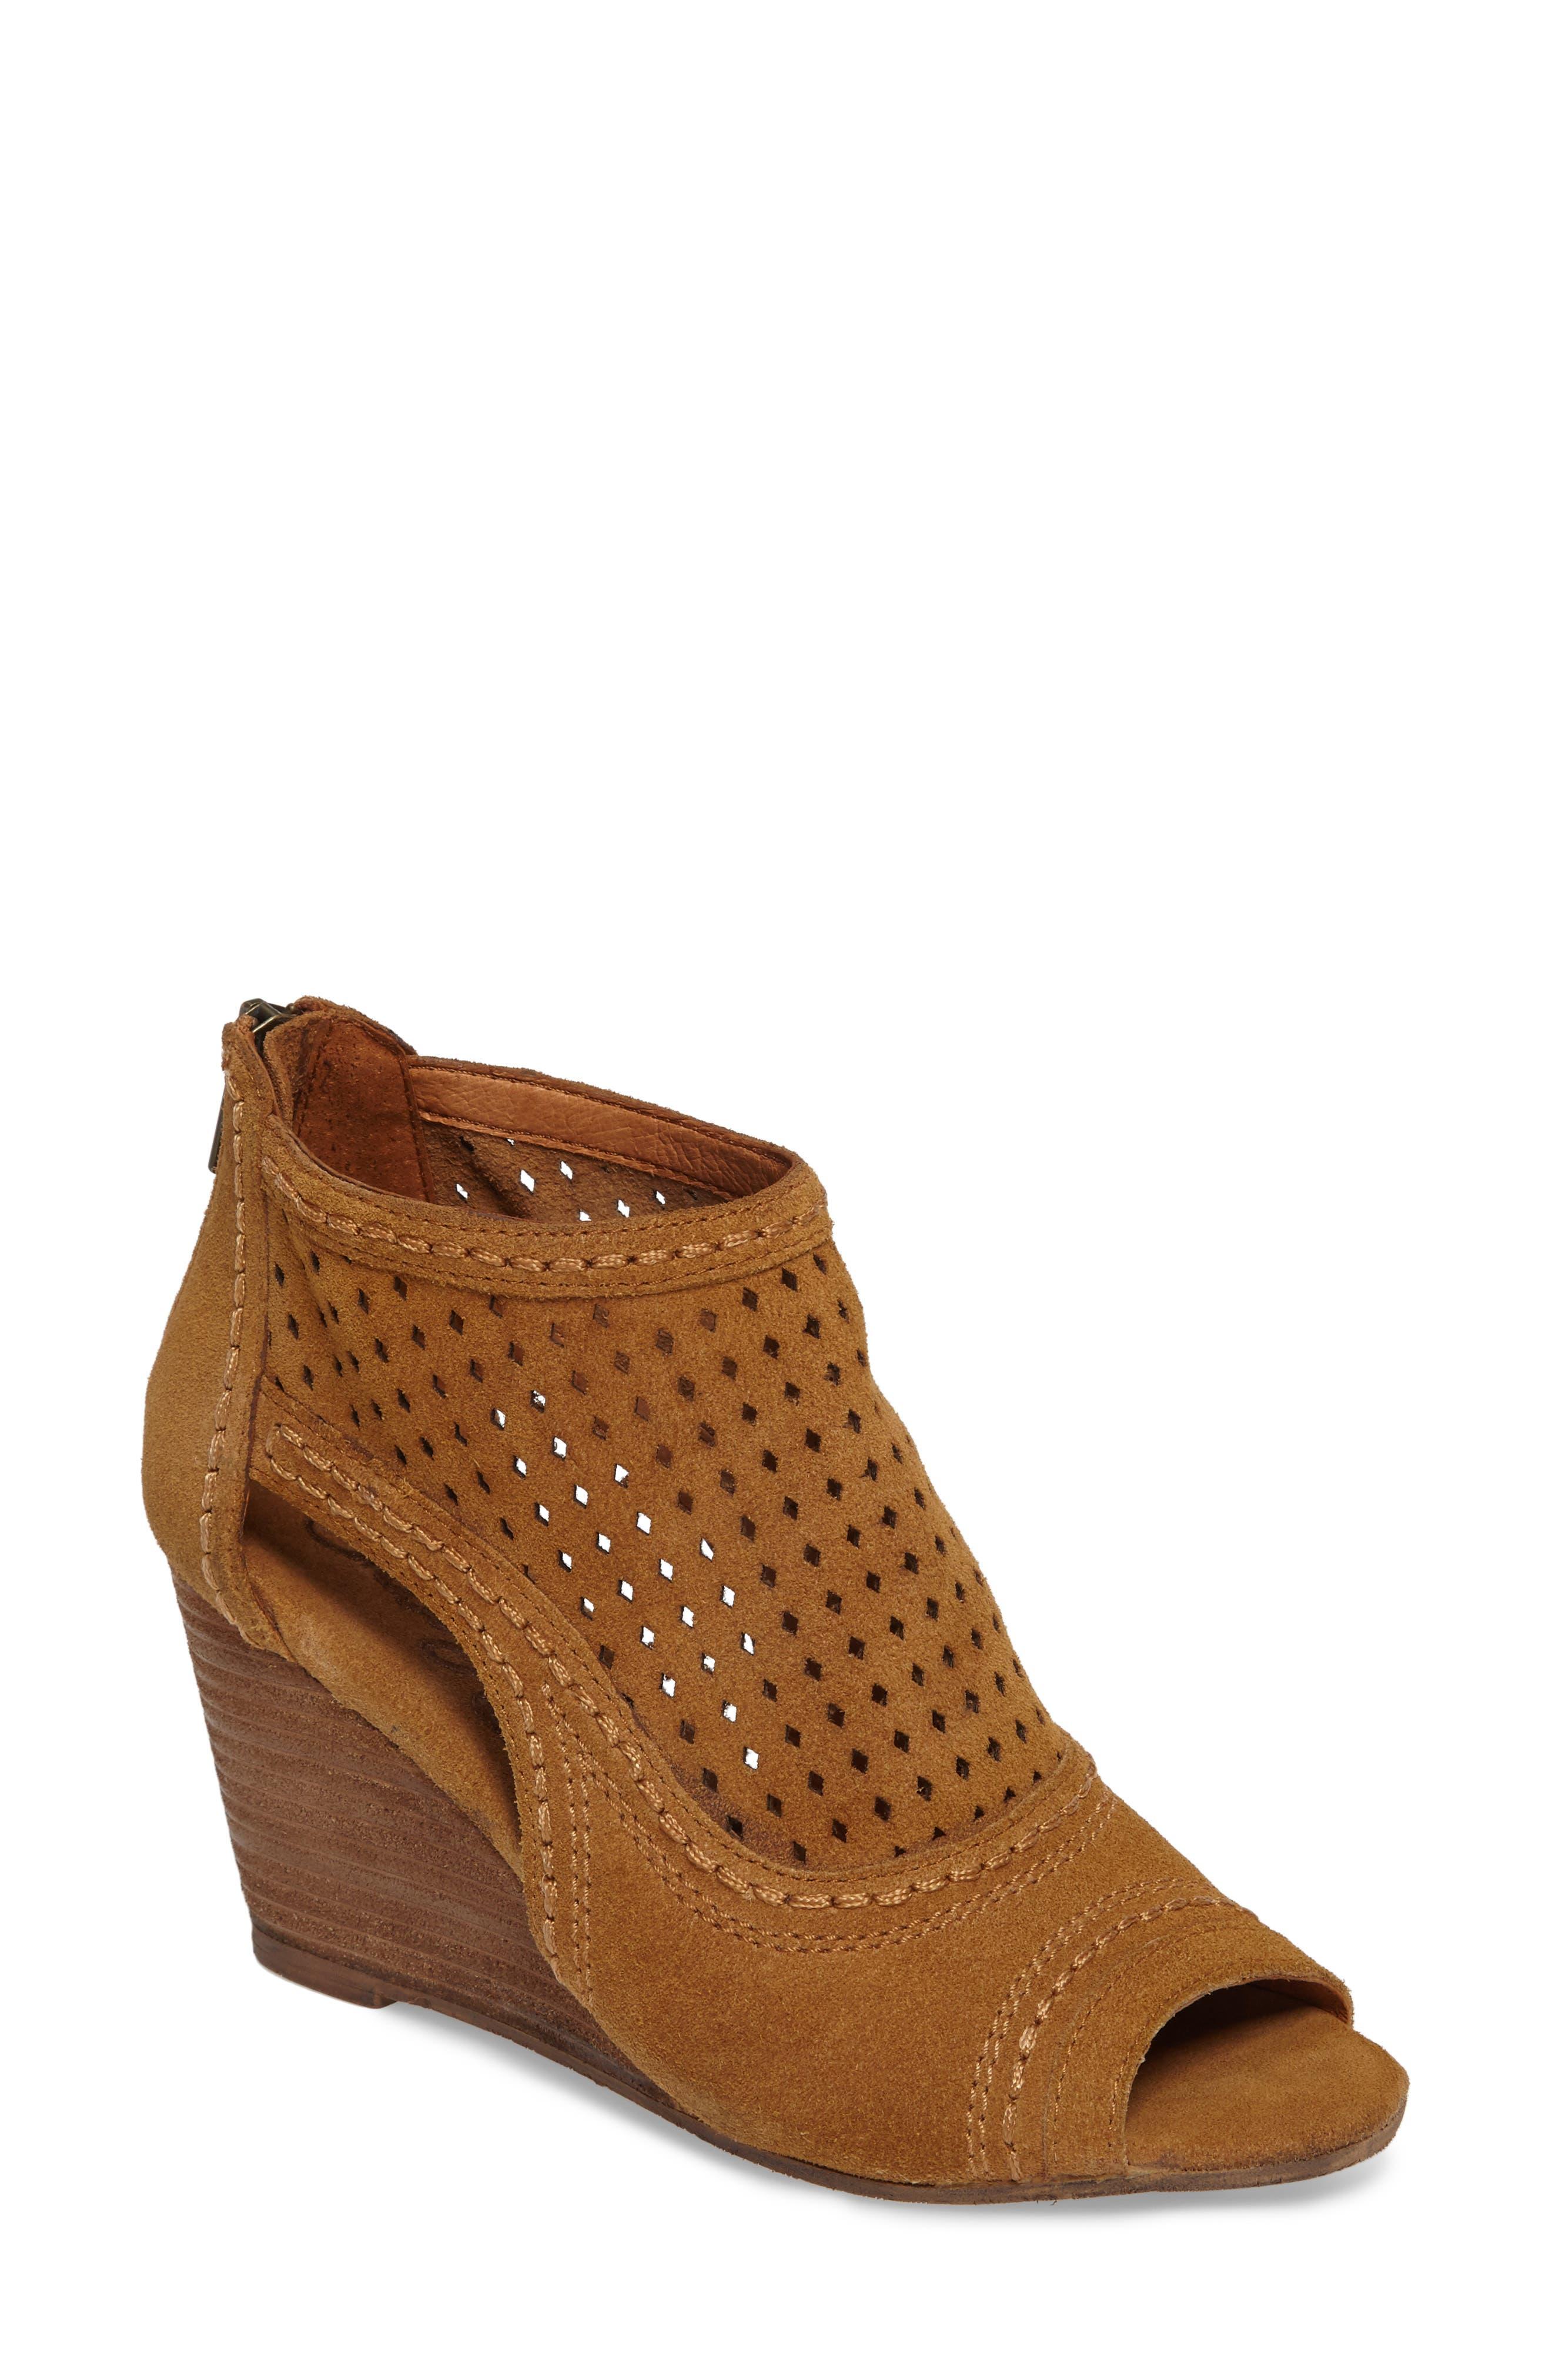 NAUGHTY MONKEY Sharon Perforated Wedge Sandal